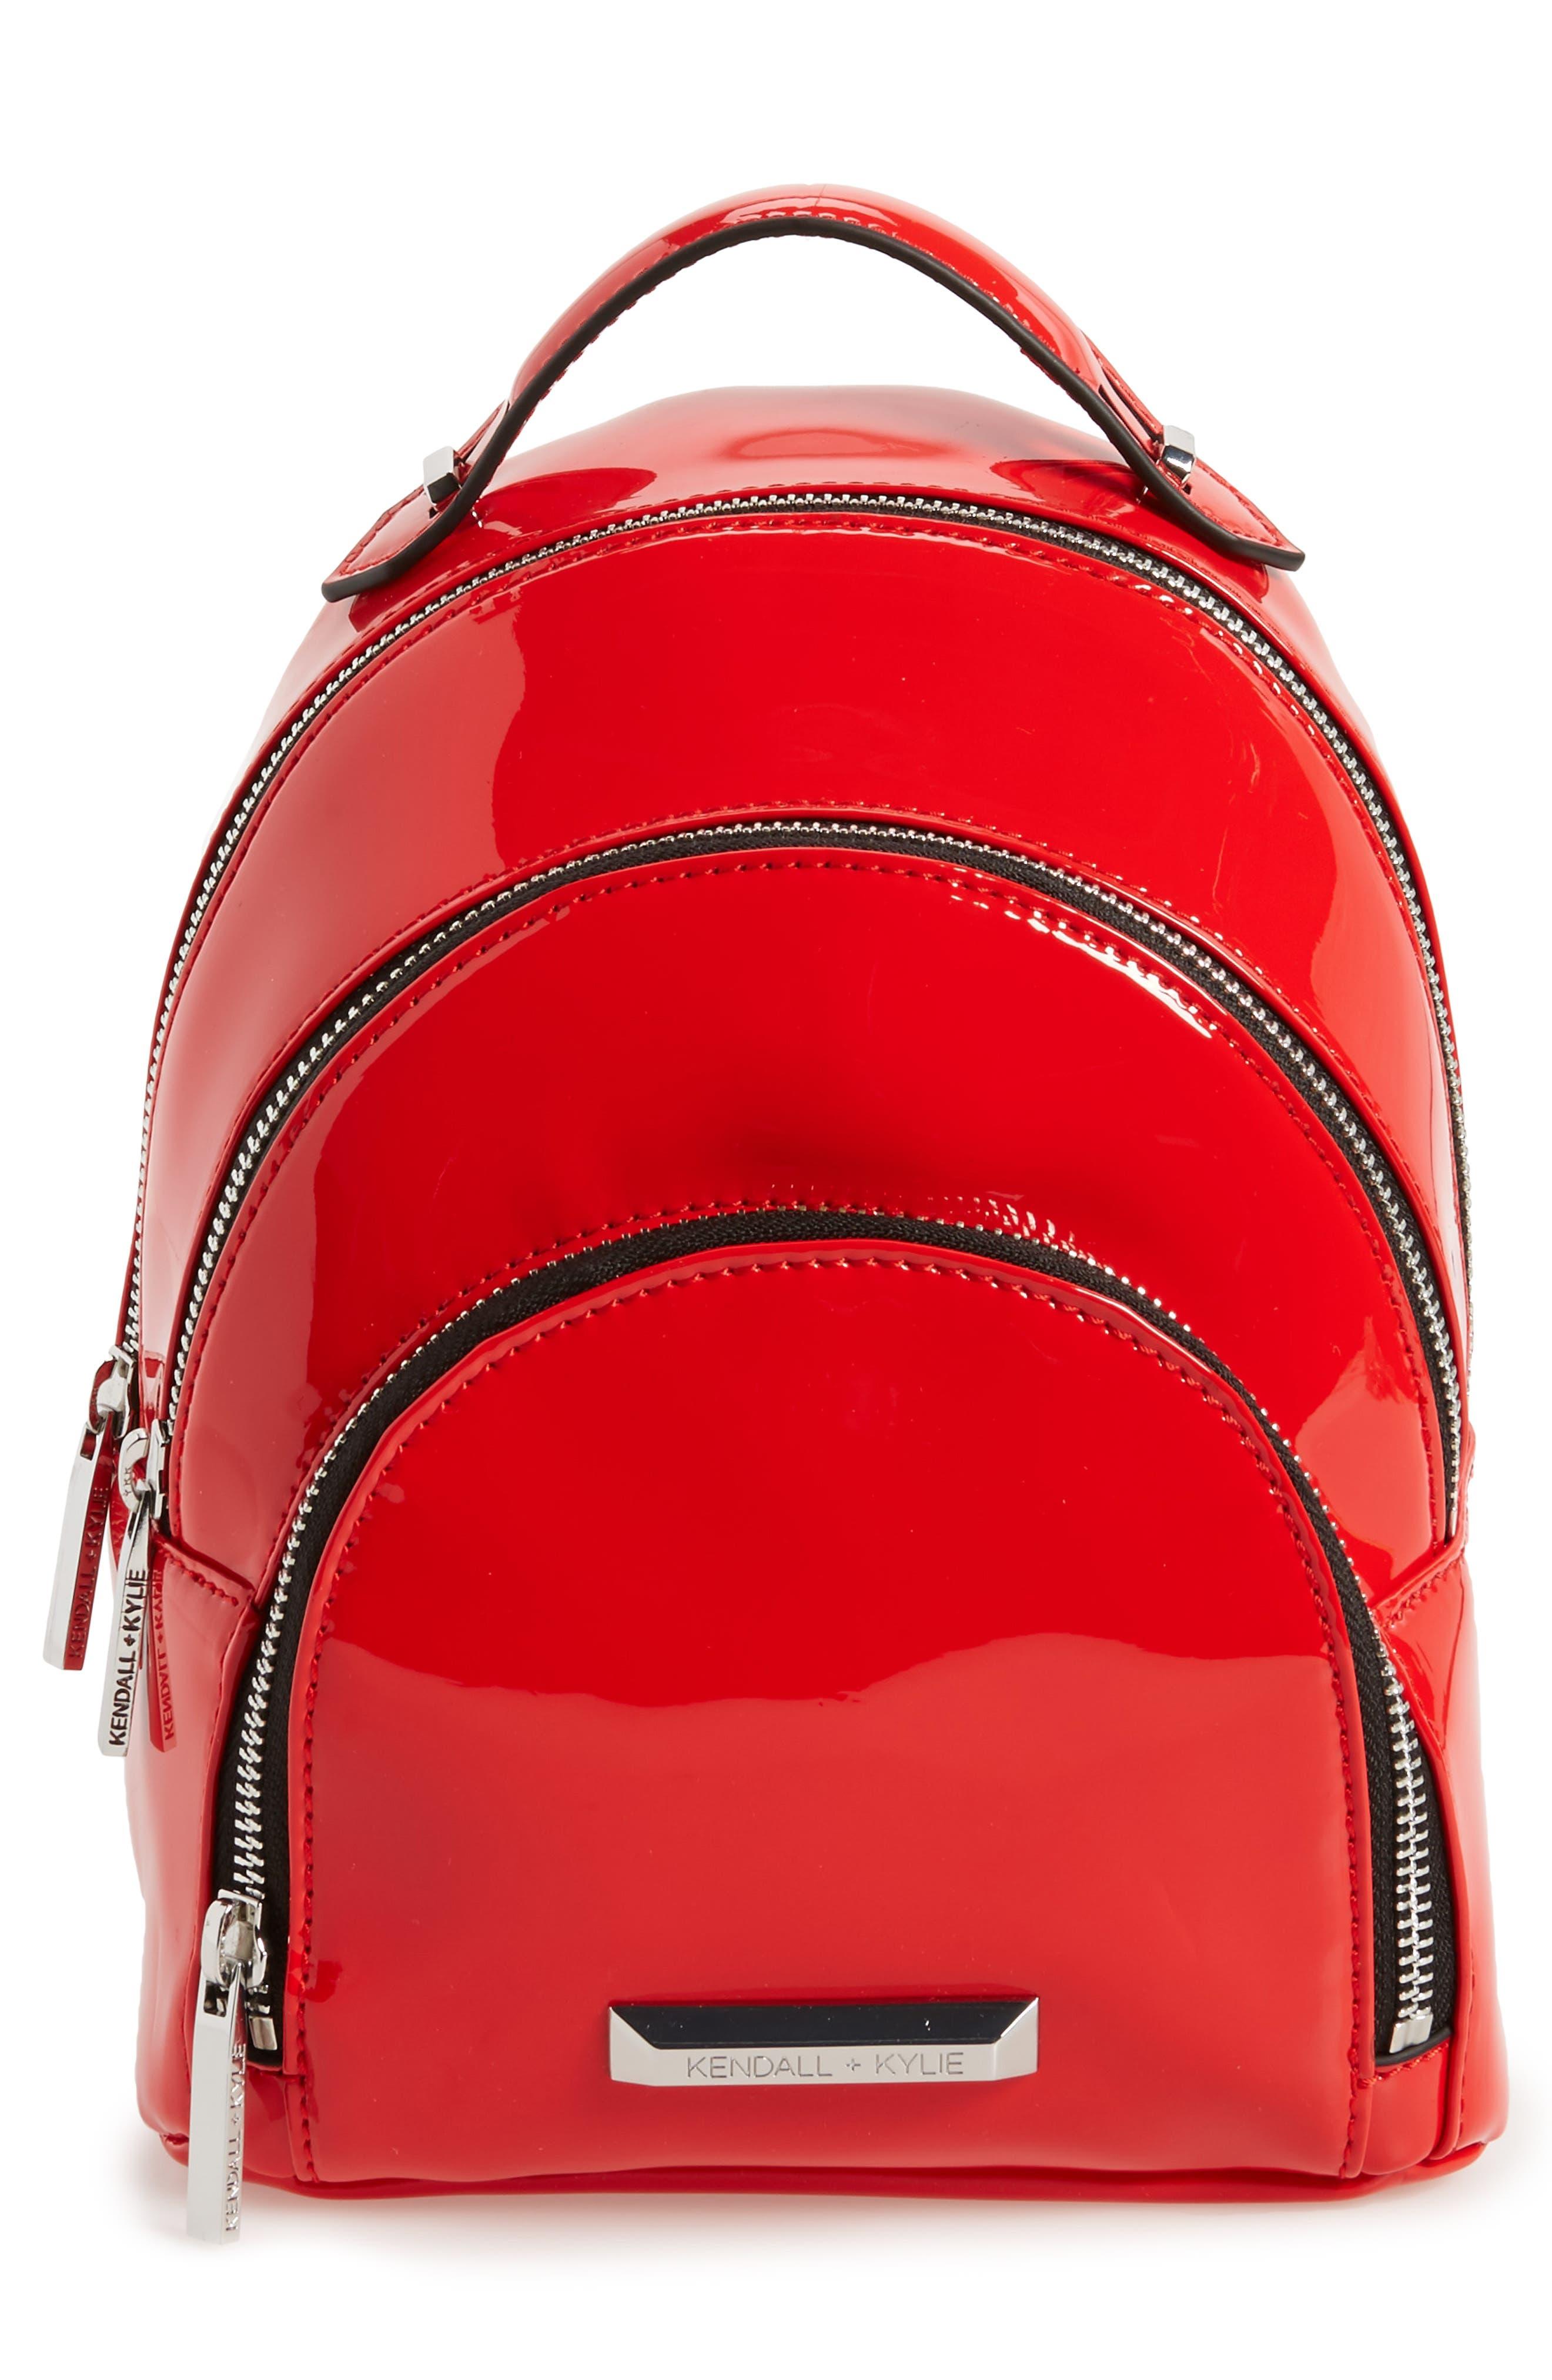 Alternate Image 1 Selected - KENDALL + KYLIE Mini Sloane Backpack